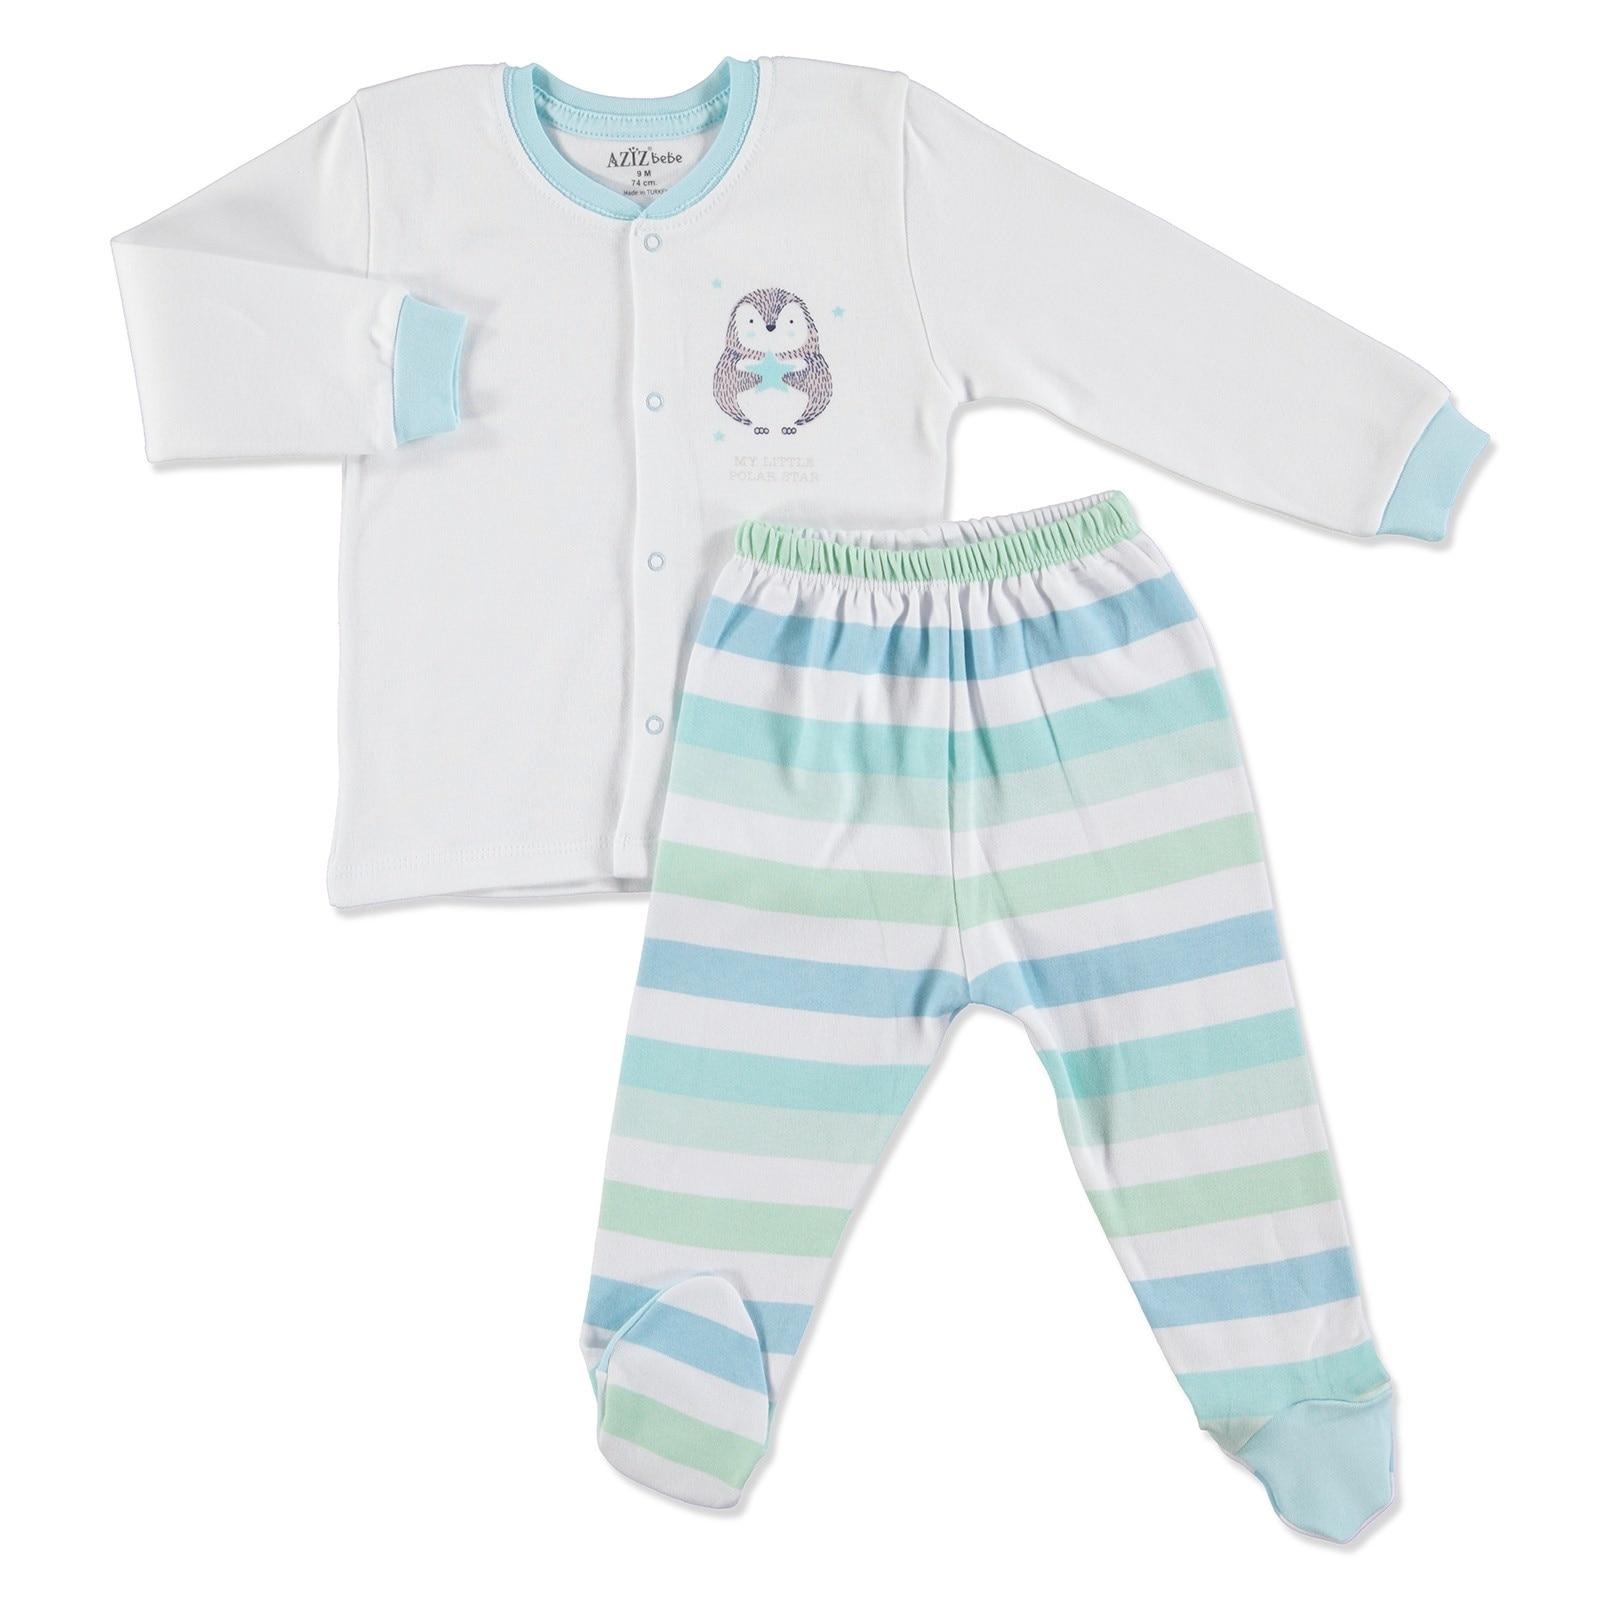 Ebebek Aziz Bebe bebé encaje Cardigan pantalón de pie 2 uds